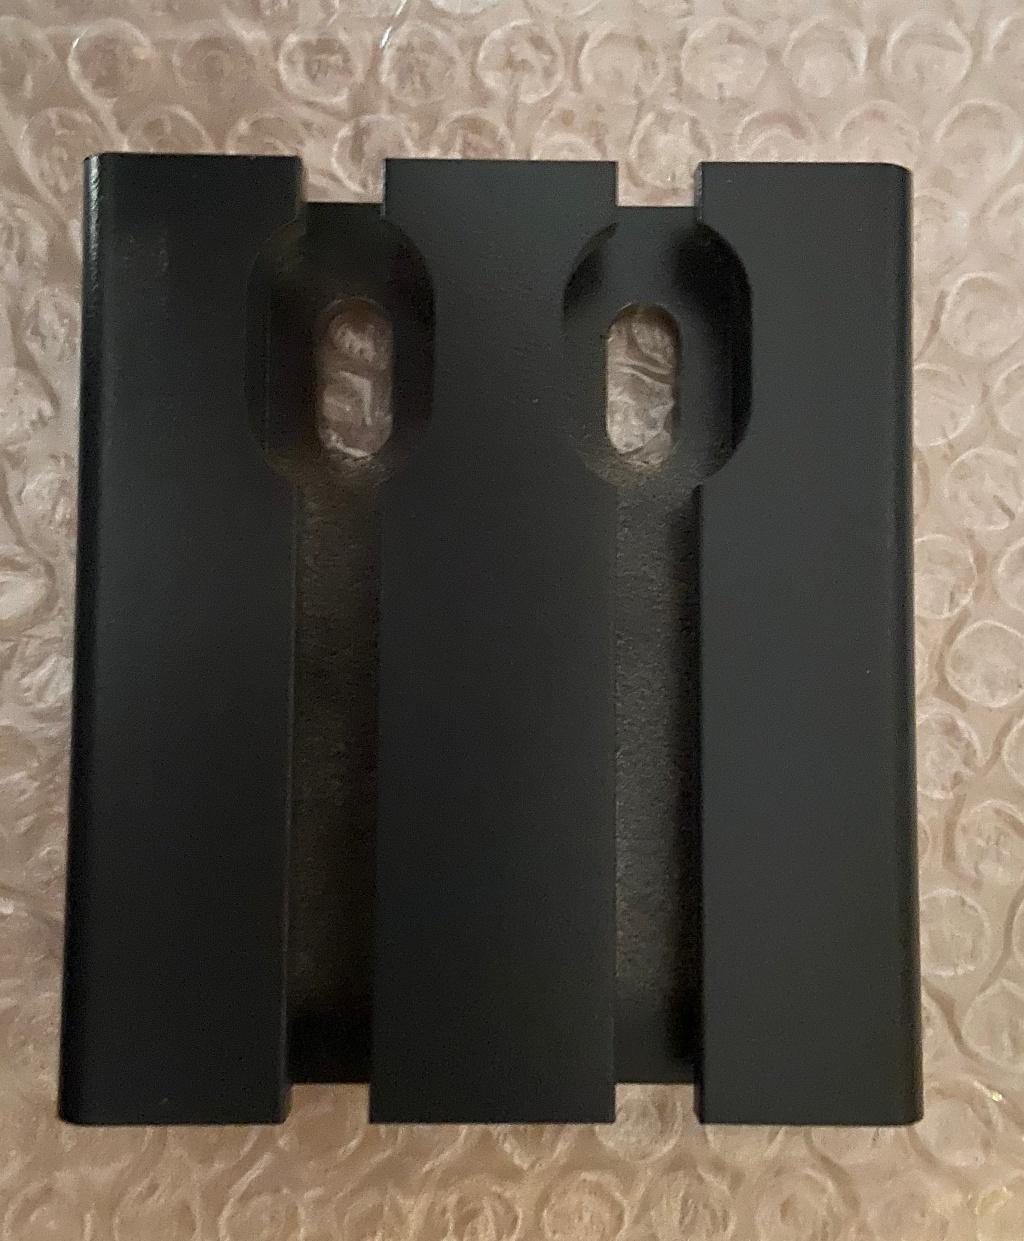 apto-markisen-made-in-germany-Konsole-f-r-Fassadenmarkise-2